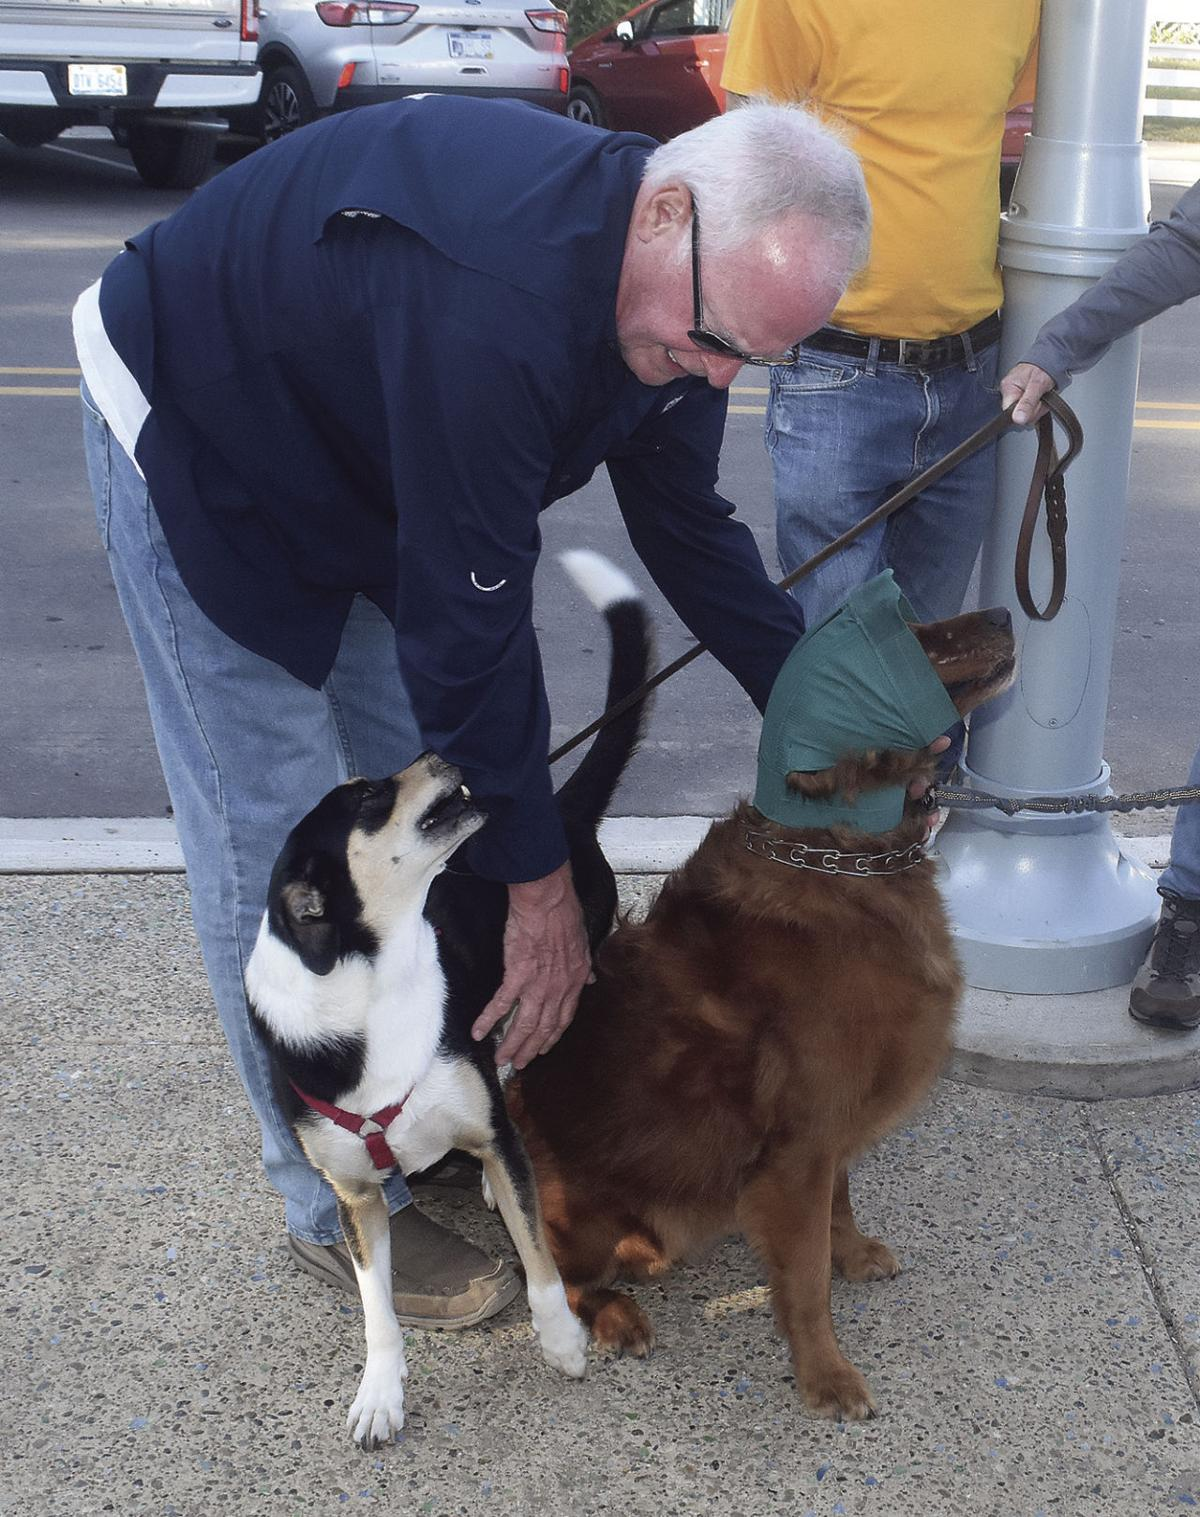 9 30 Union Pier 2 Pet Dogs.jpg